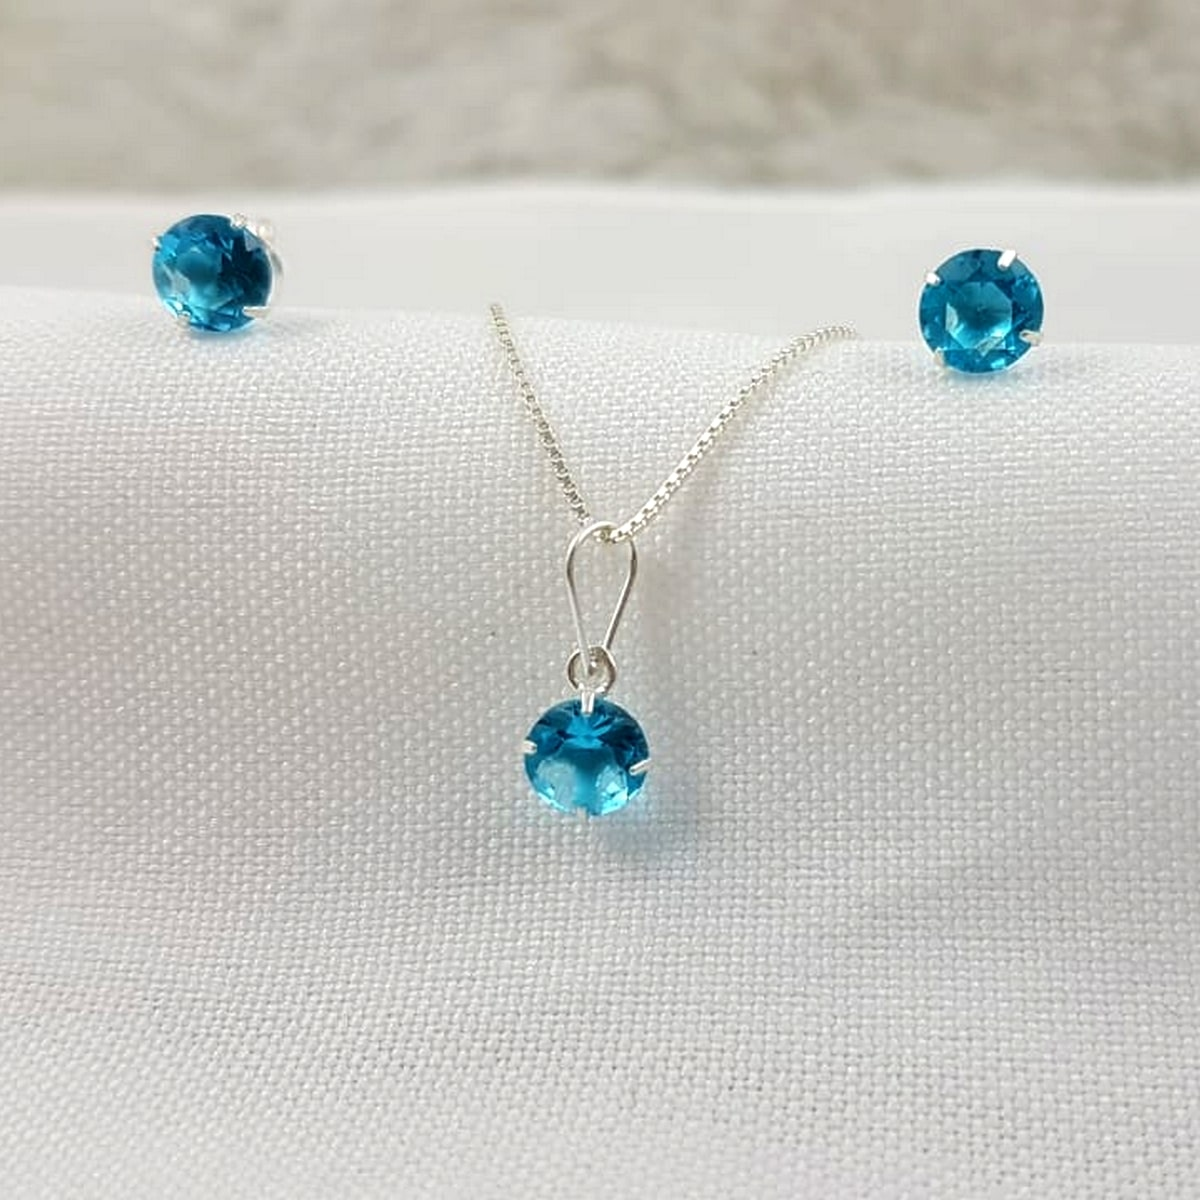 Conjunto Prata Feminina Pedra Azul Bebe